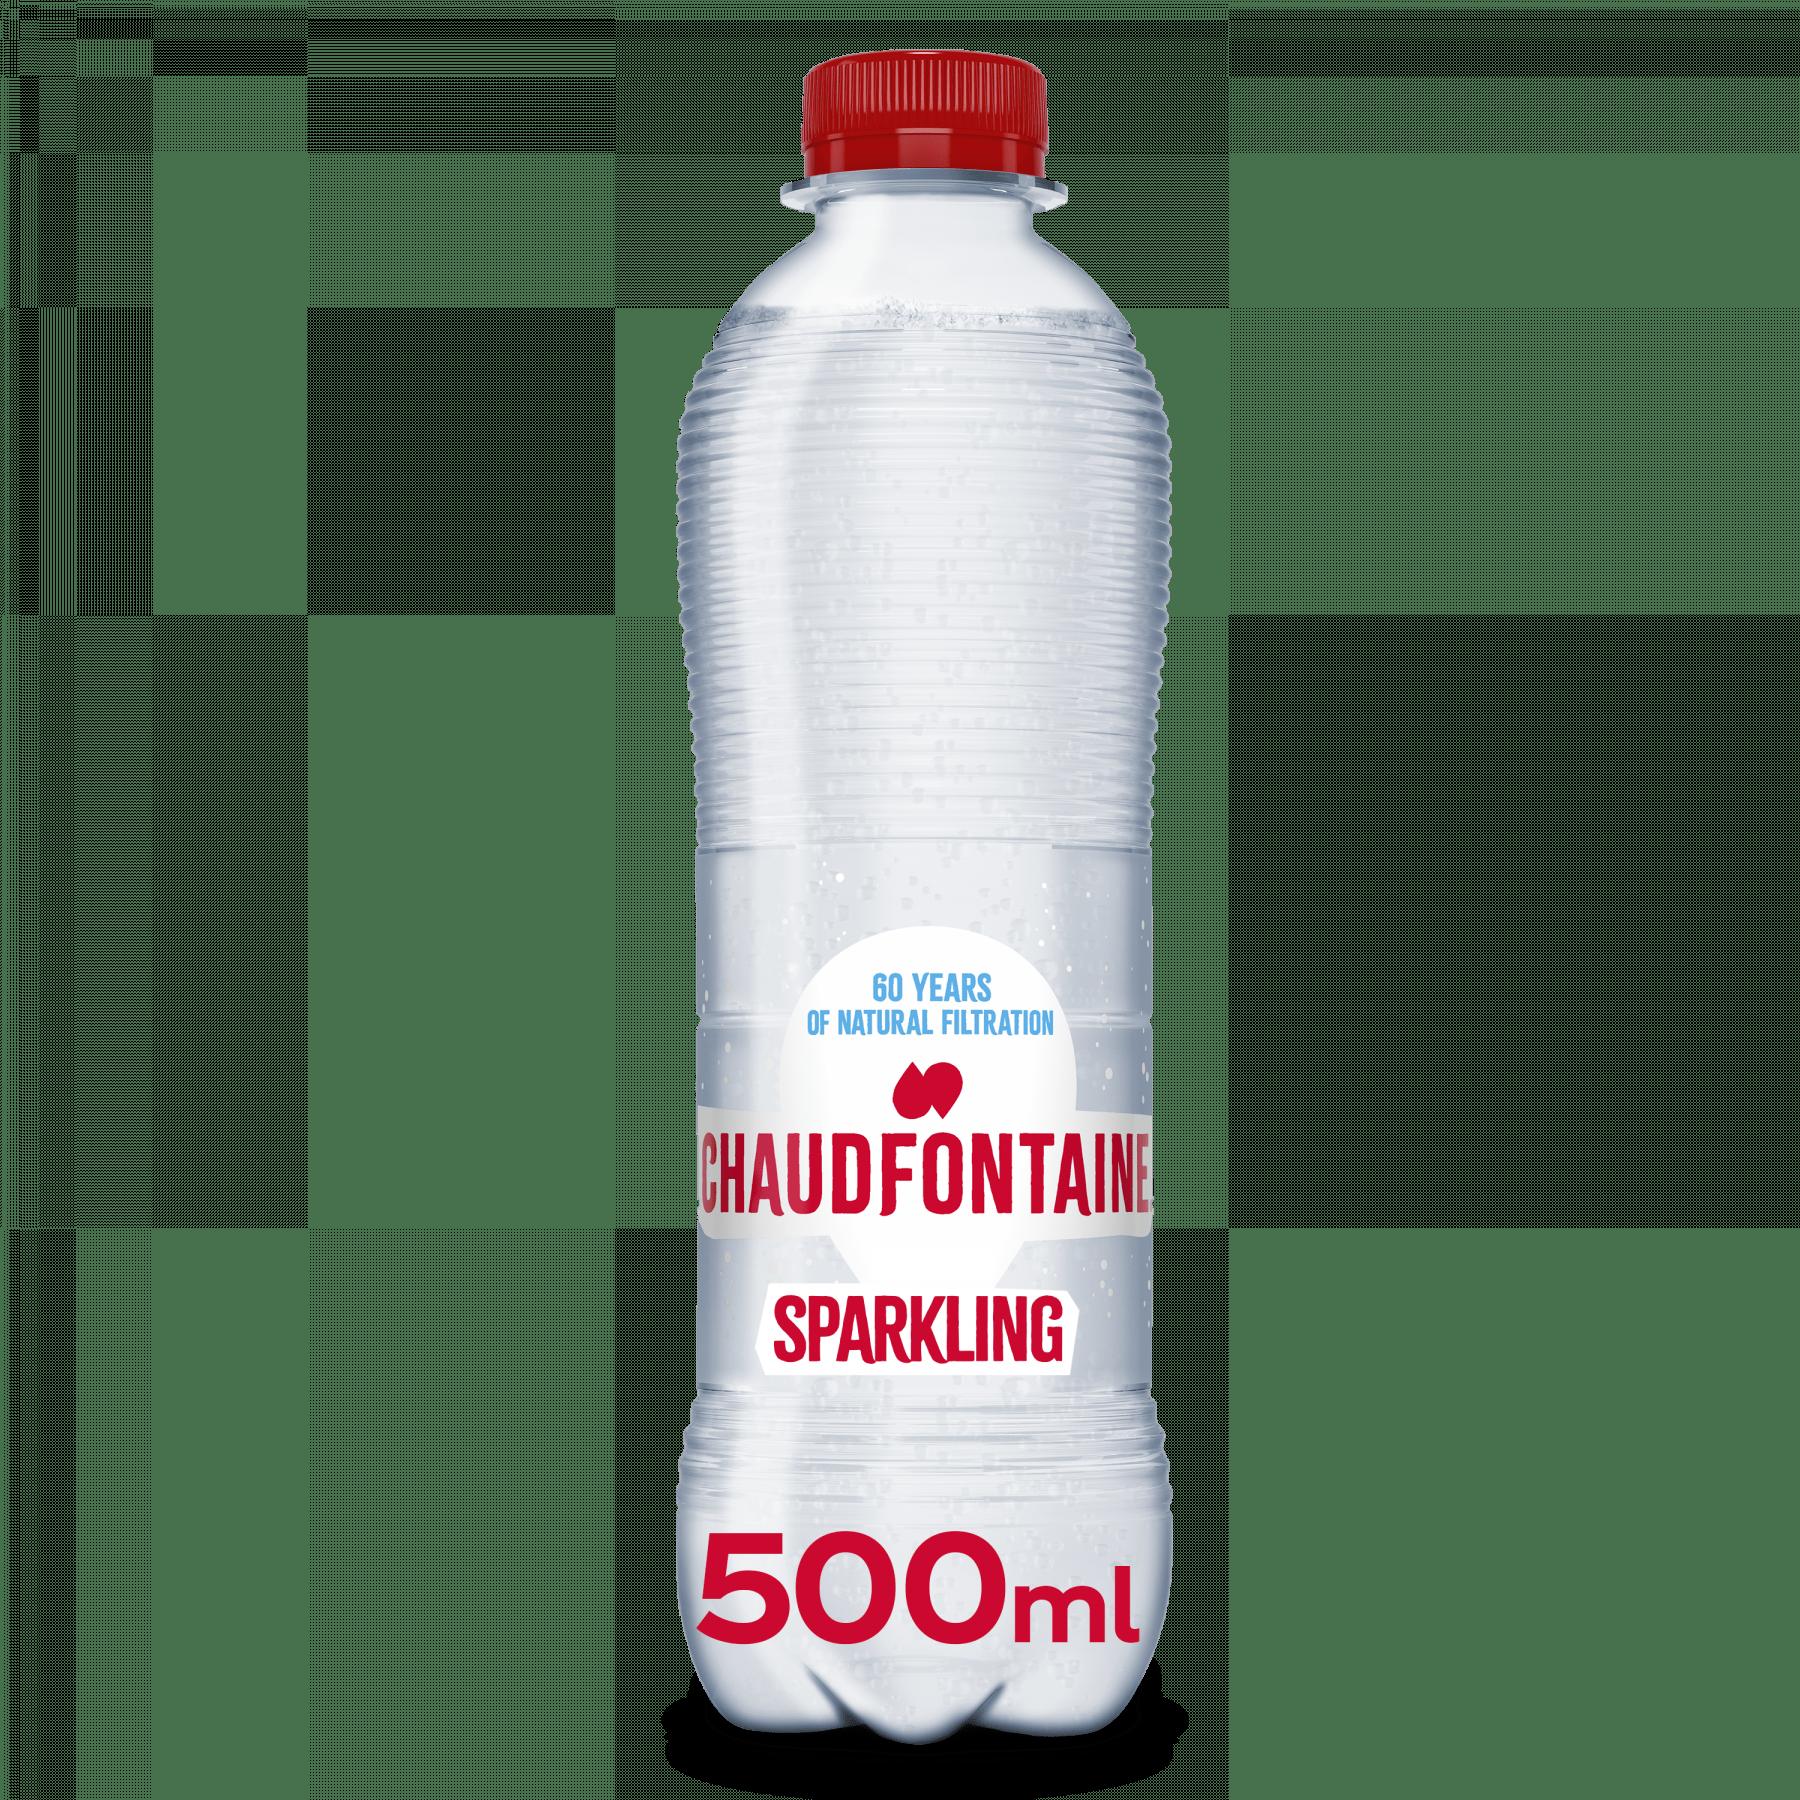 Chaudfontaine Sparkling | Petfles 24 x 0,5 liter